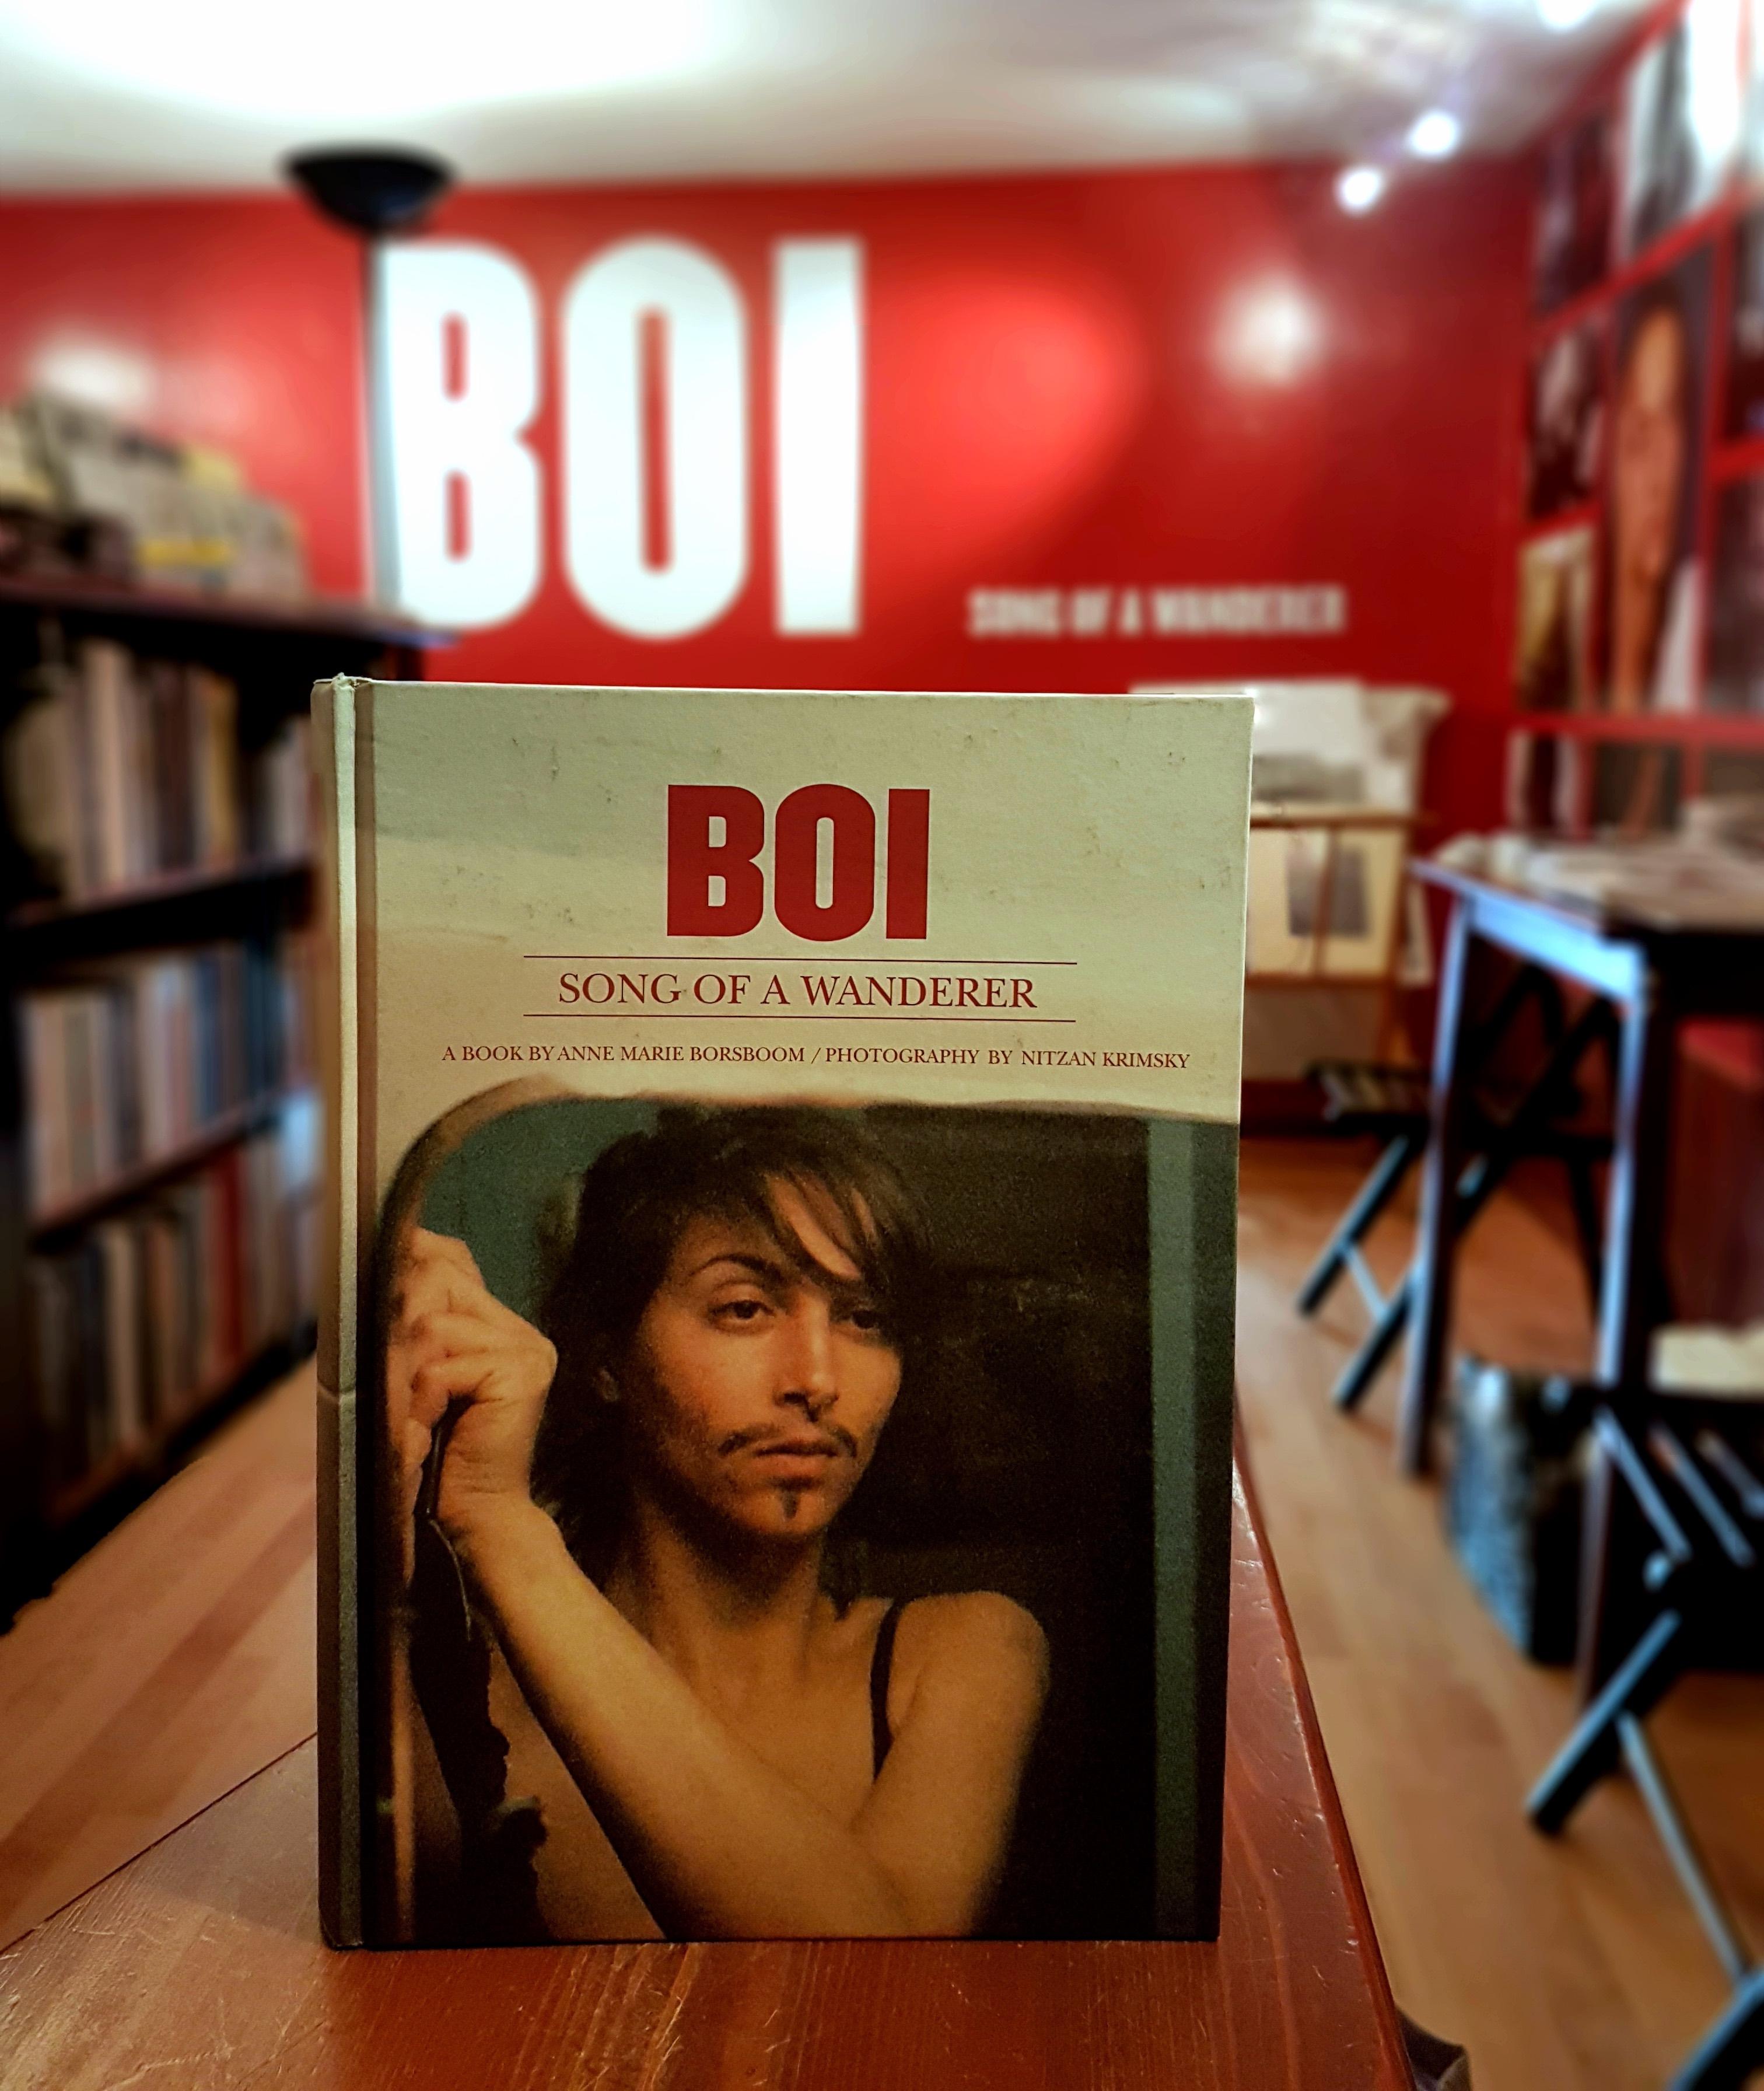 BOI, A Song of a Wanderer